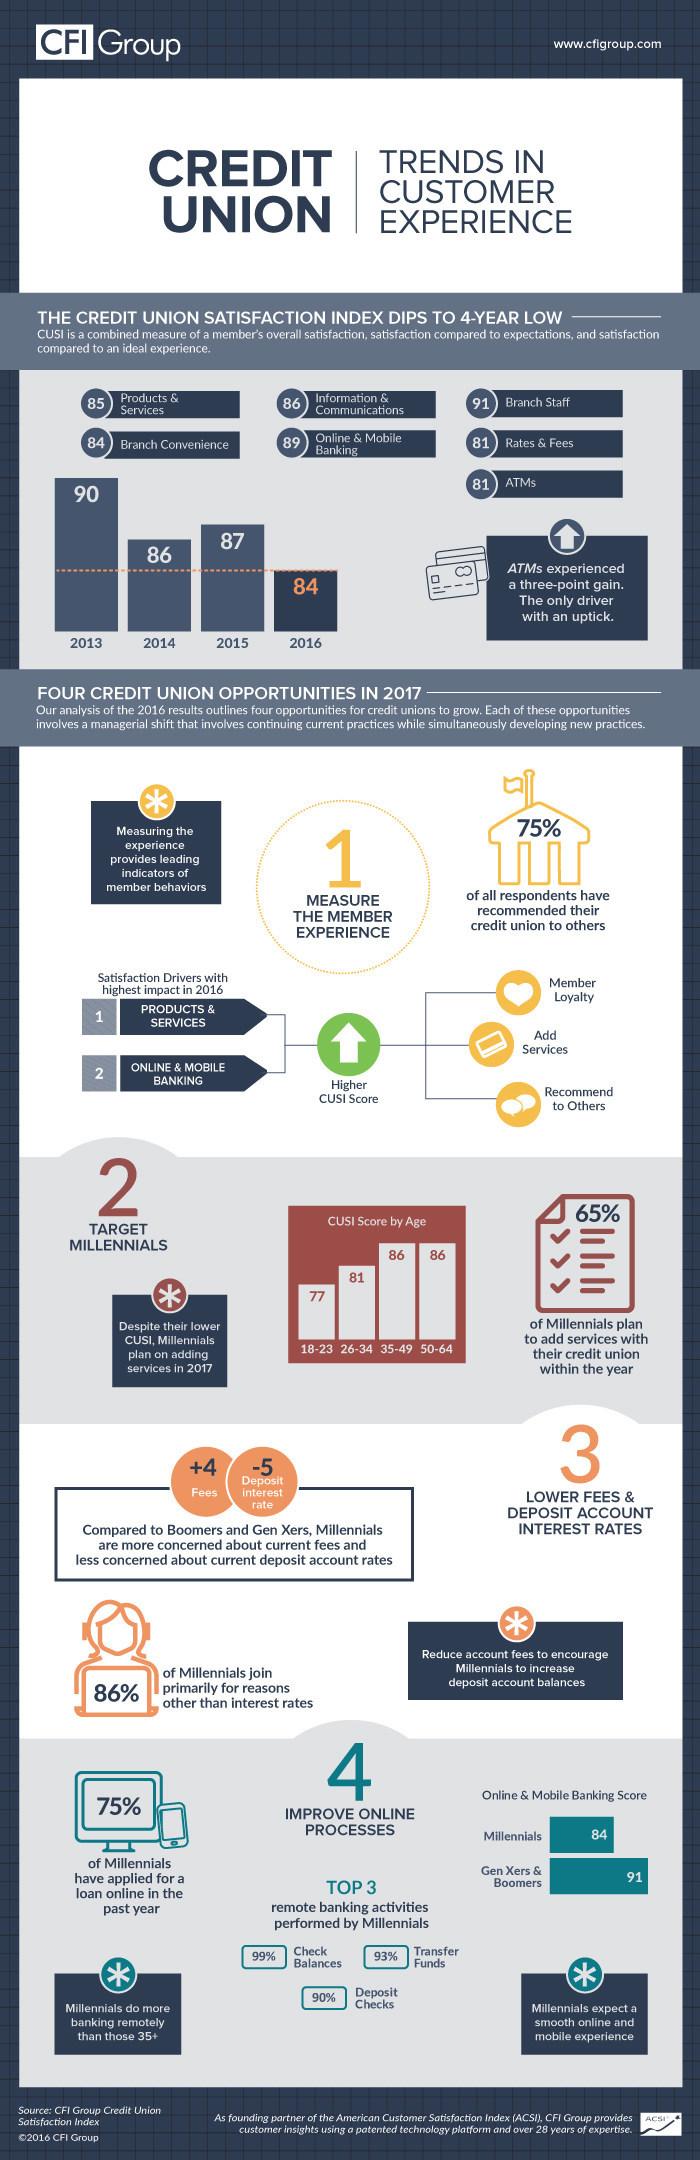 Credit Union Satisfaction Index 2016 infographic